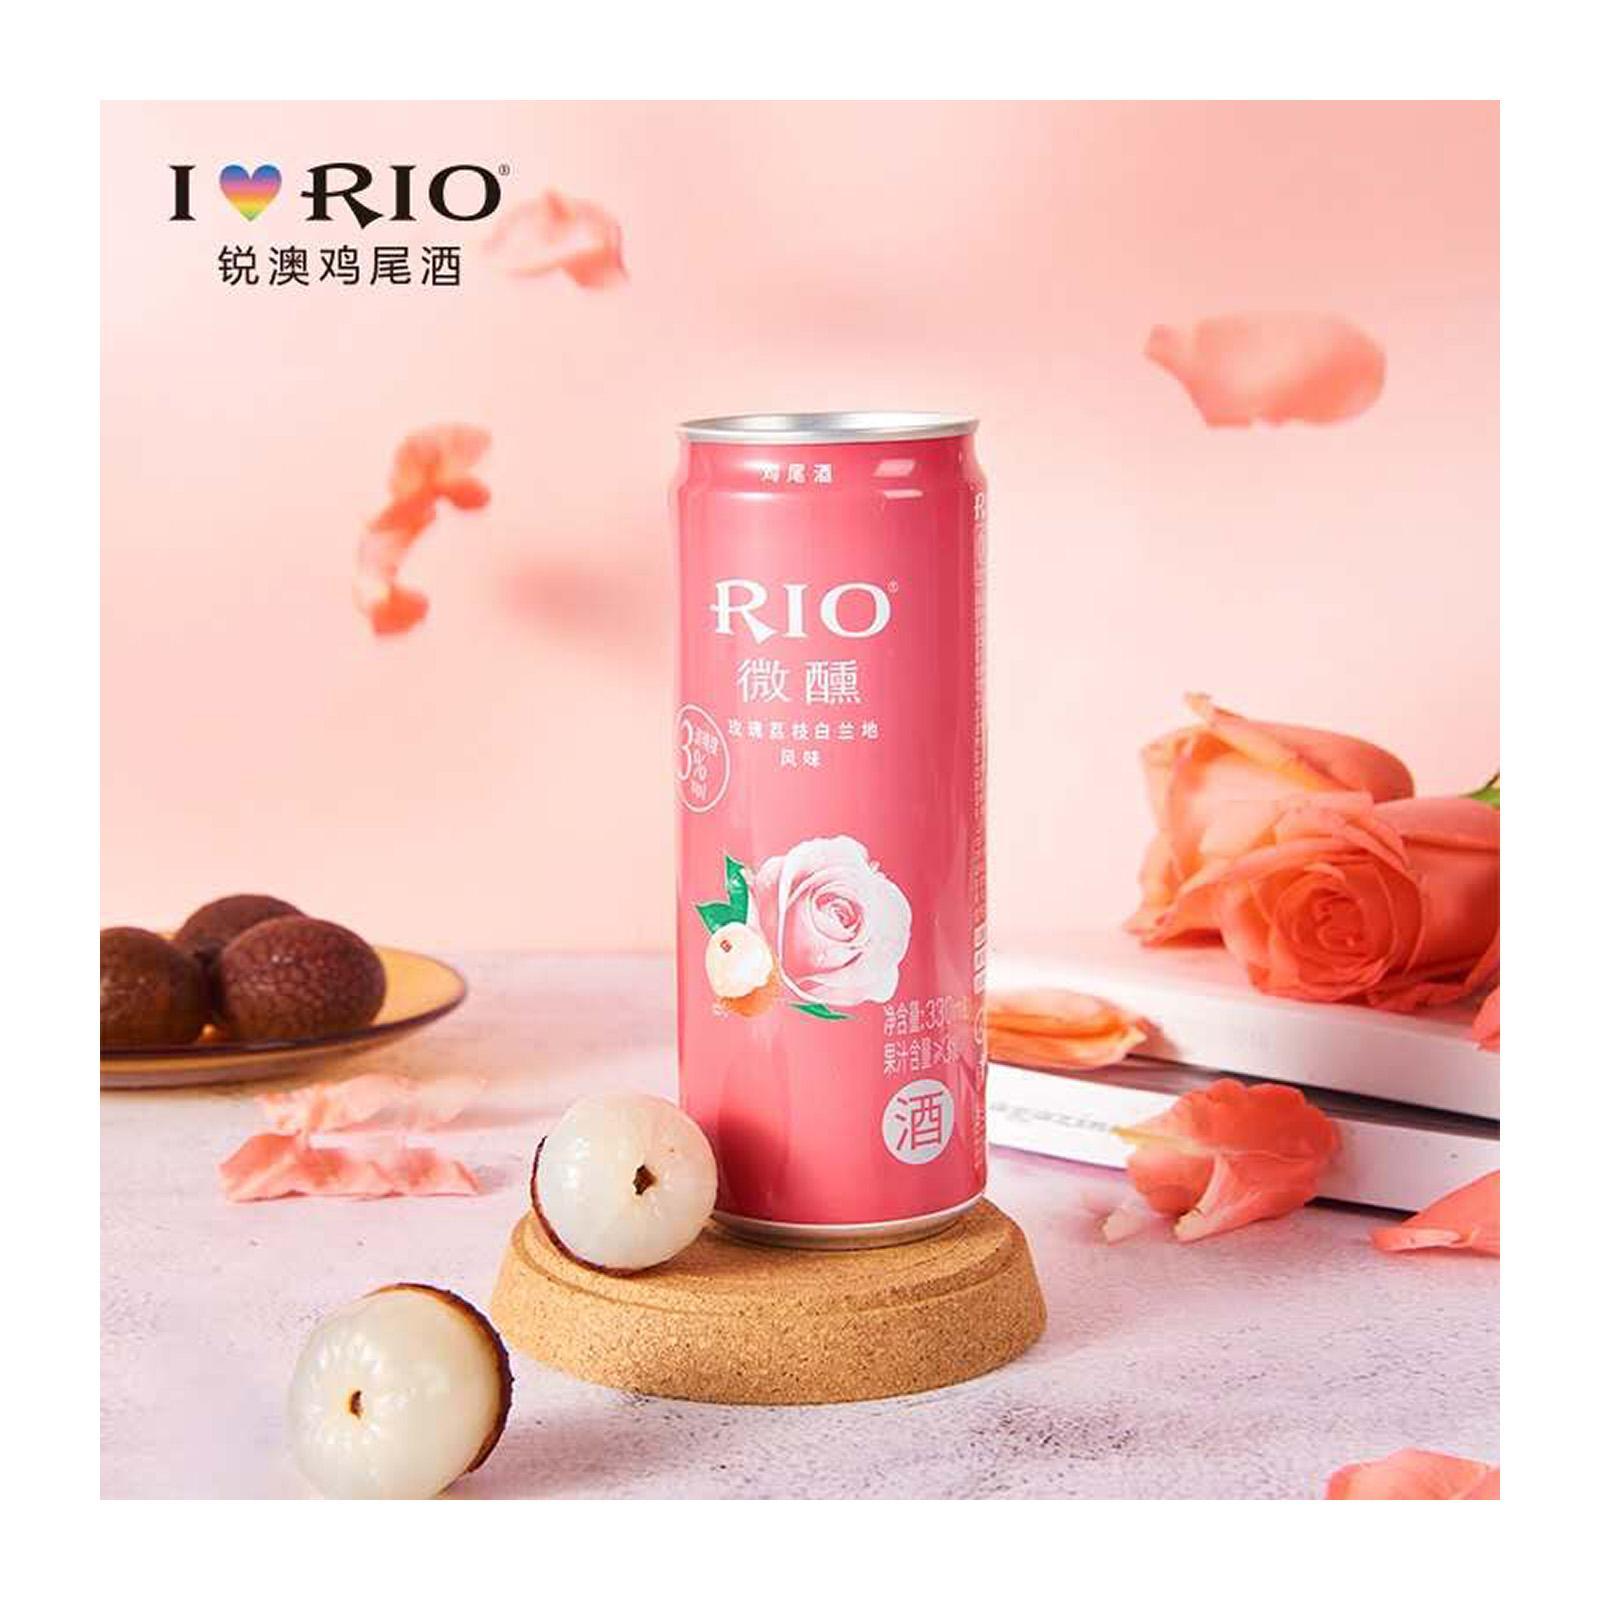 Rio Cocktail Rose Lychee+Brandy 3.0% 330 ML